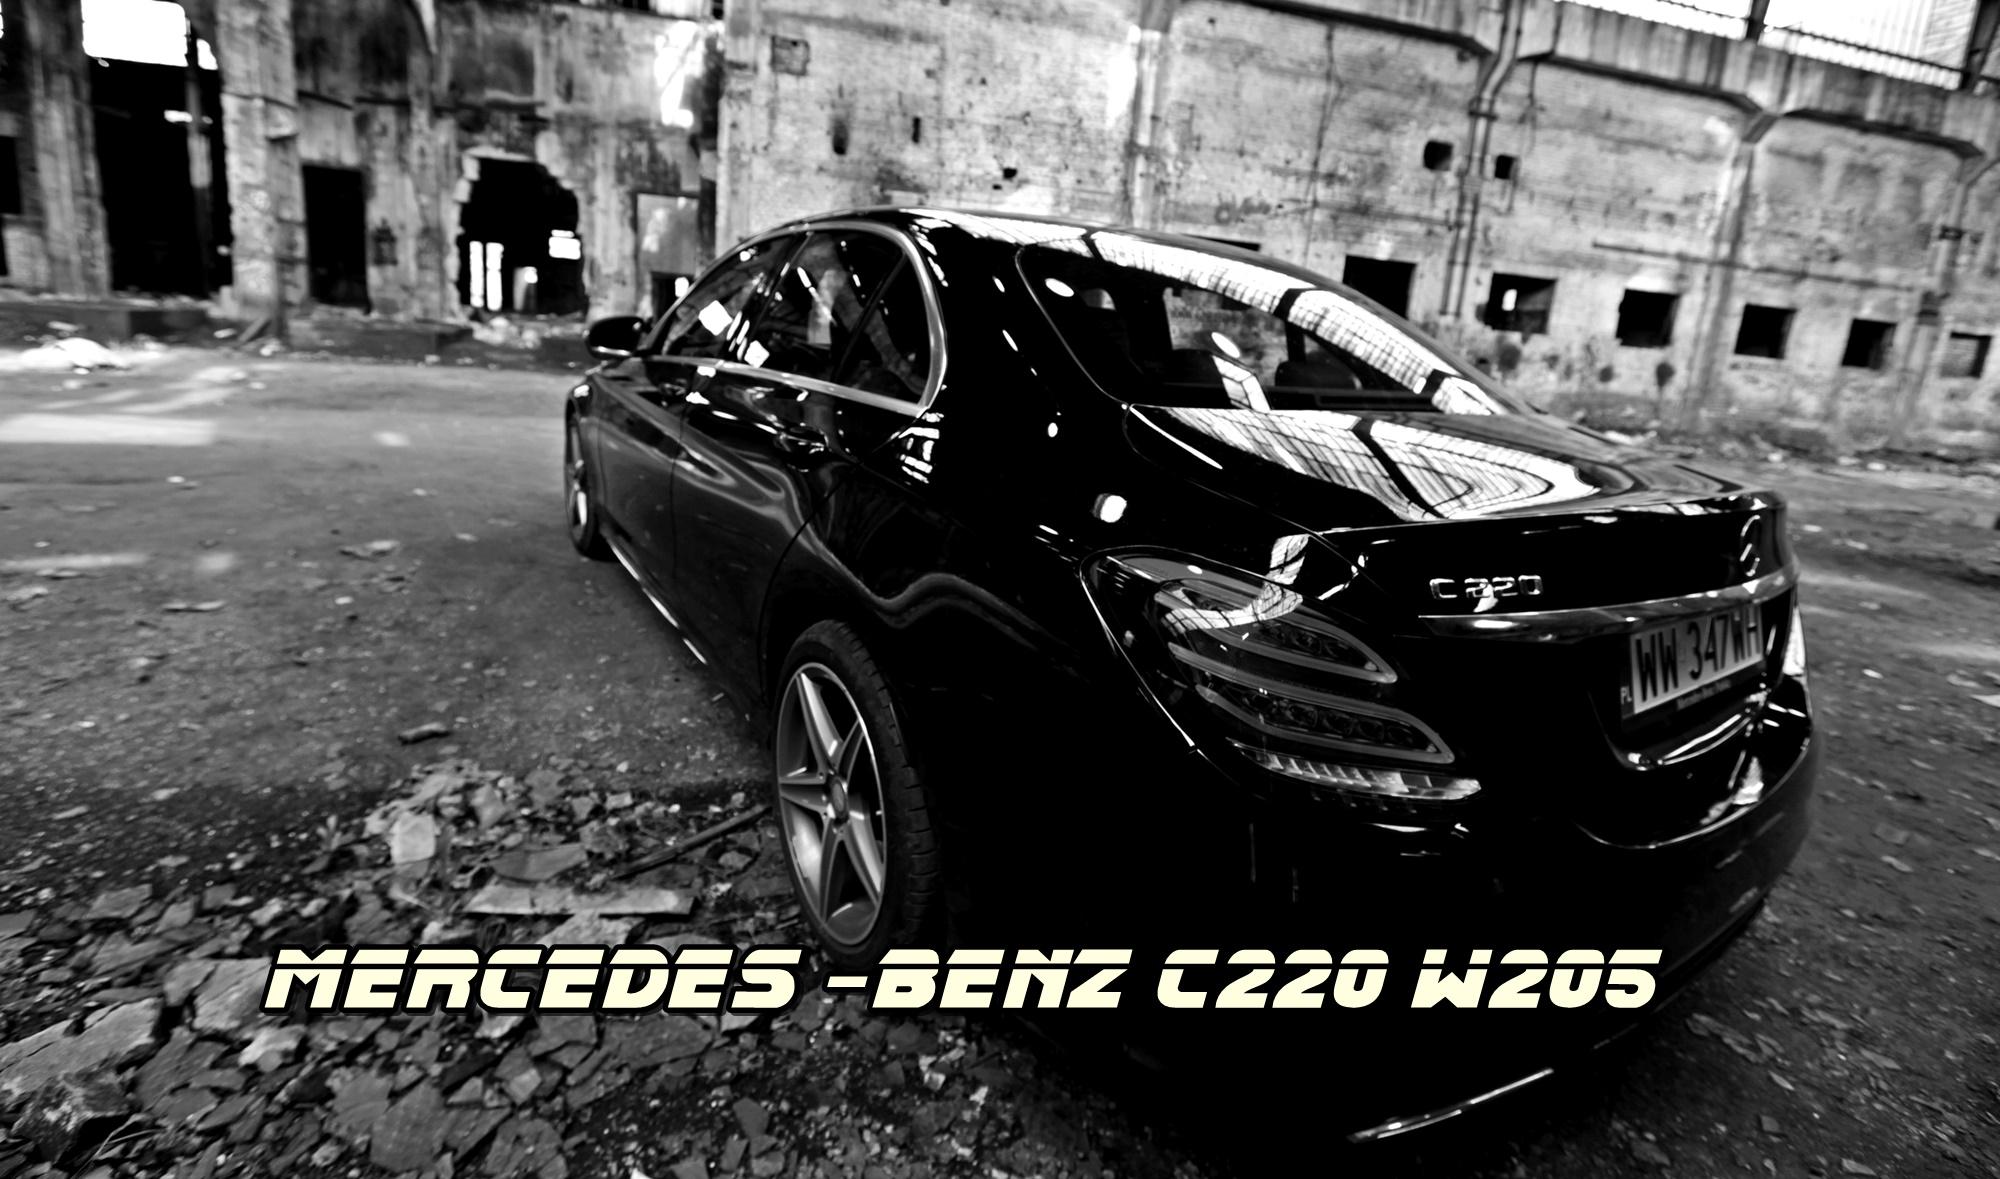 Mercedes C220 BlueTEC Test